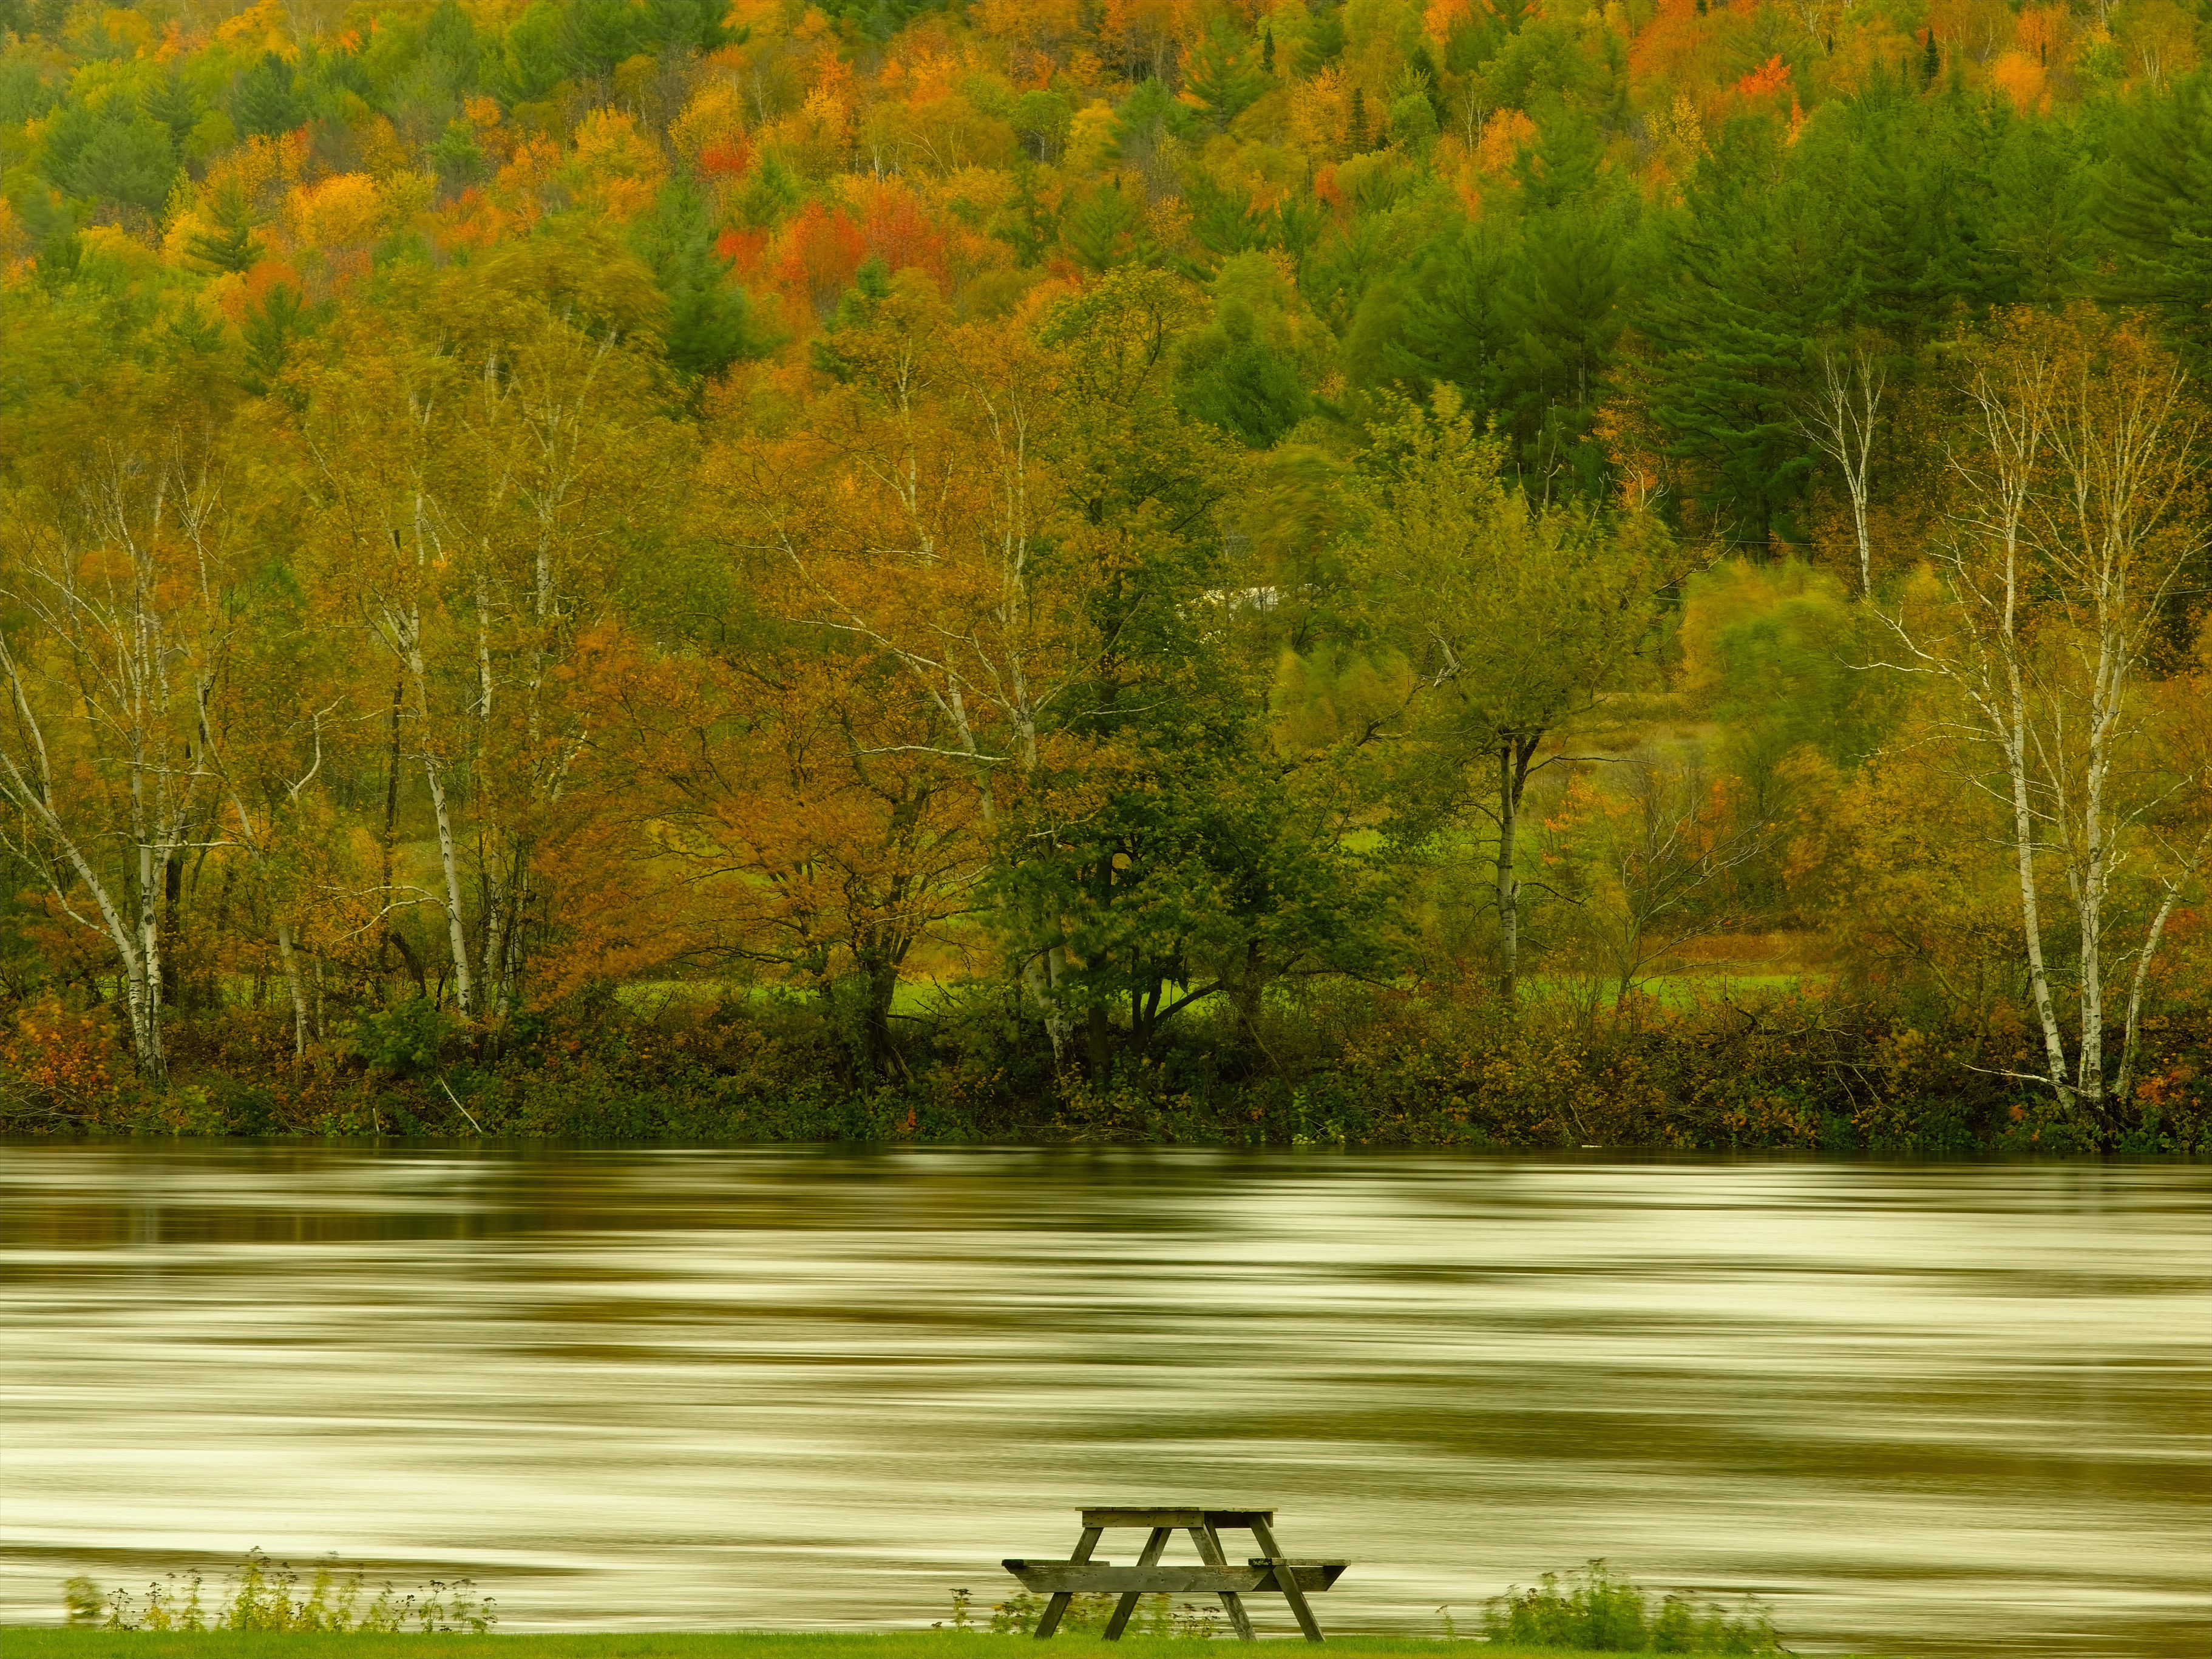 USA, Maine, Rangeley Lake, autumn